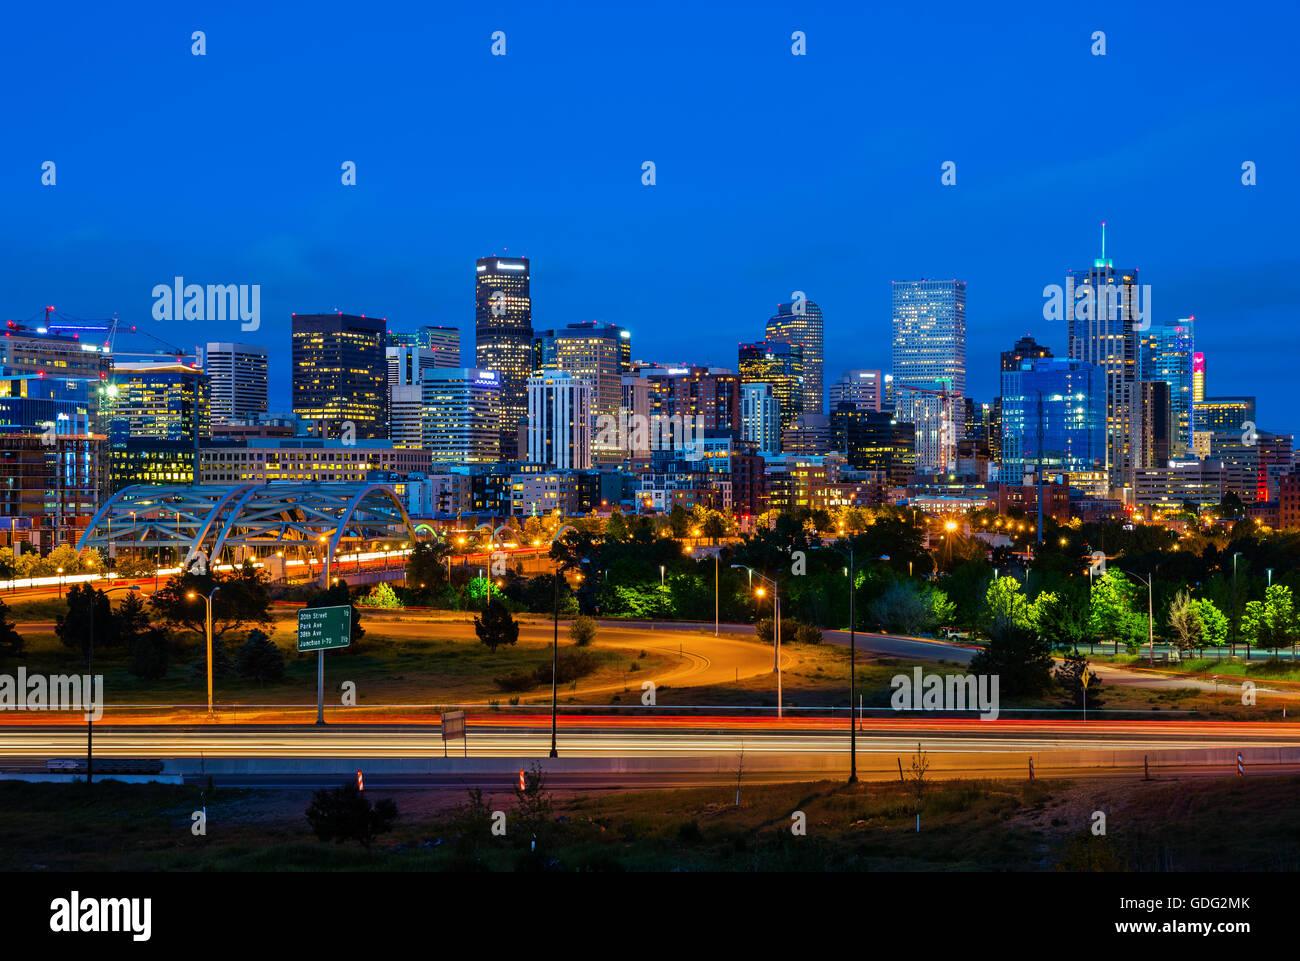 Downtown Denver Colorado at night - Stock Image